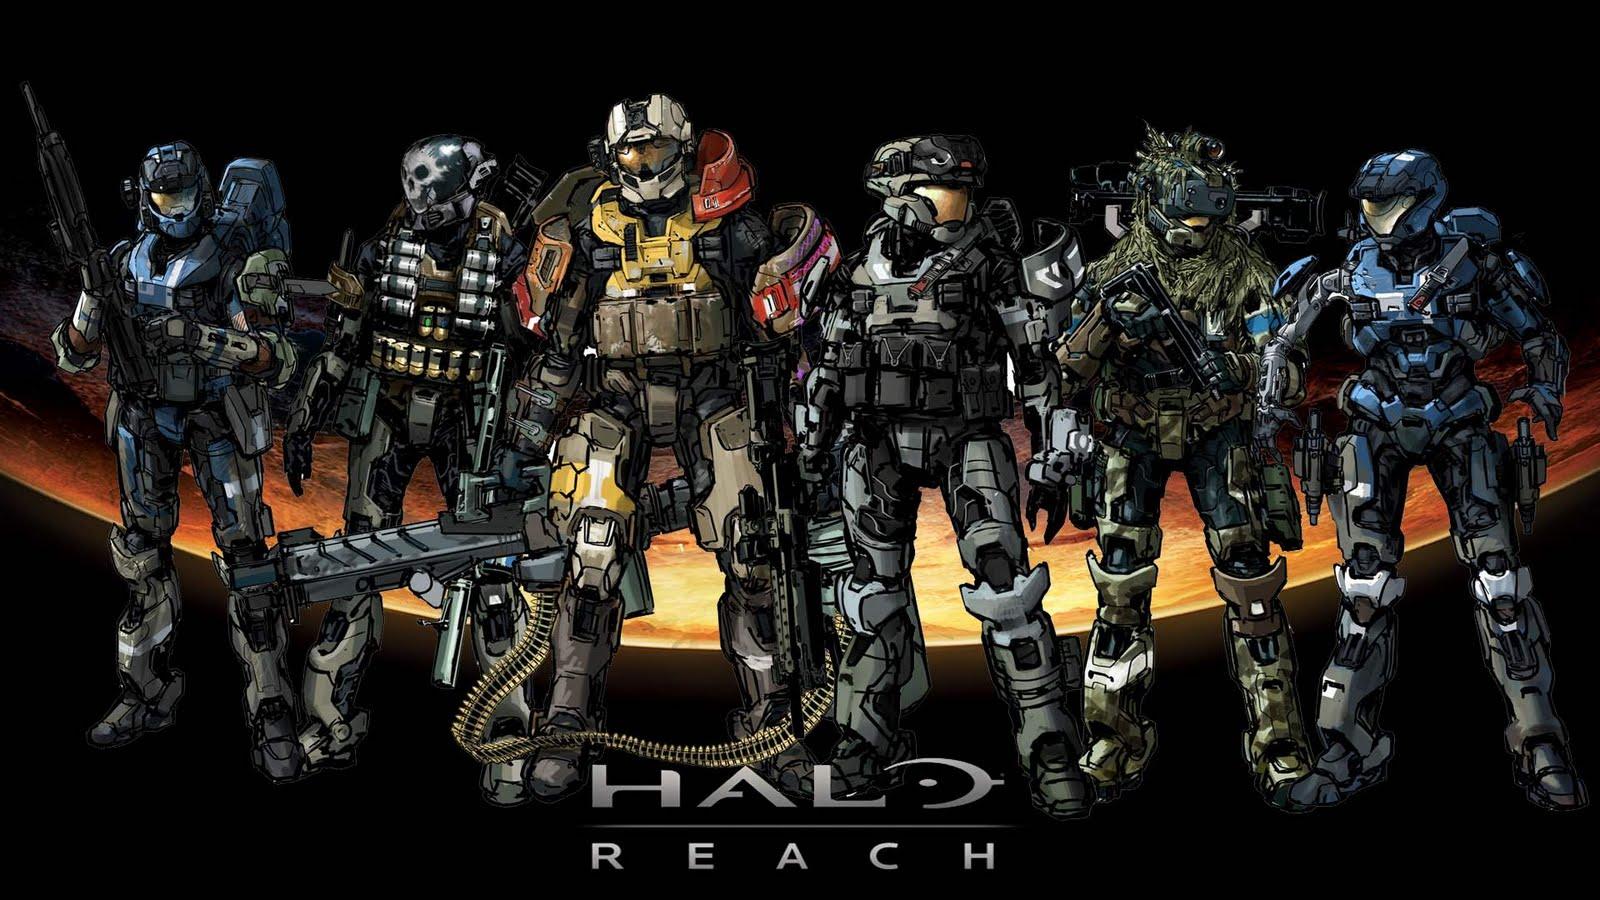 Halo 3 wallpaper 1080p 1600x900